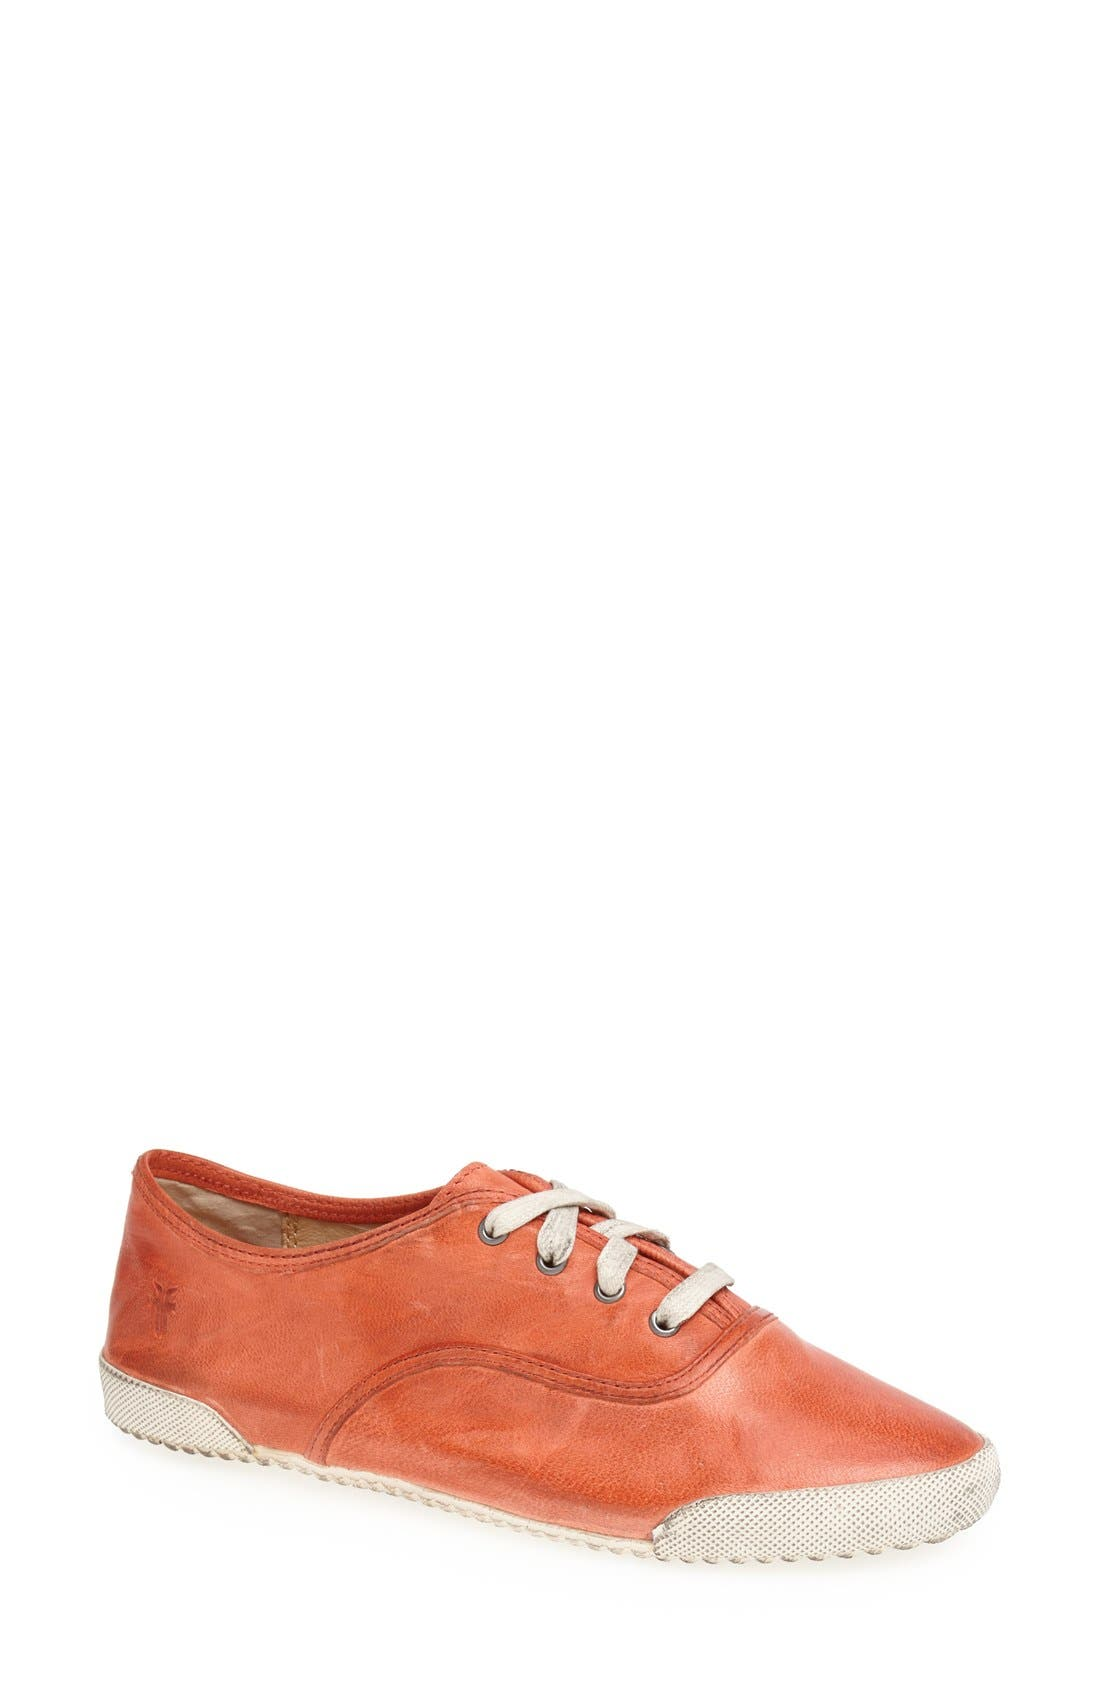 Alternate Image 1 Selected - Frye 'Melanie' Leather Sneaker (Women)